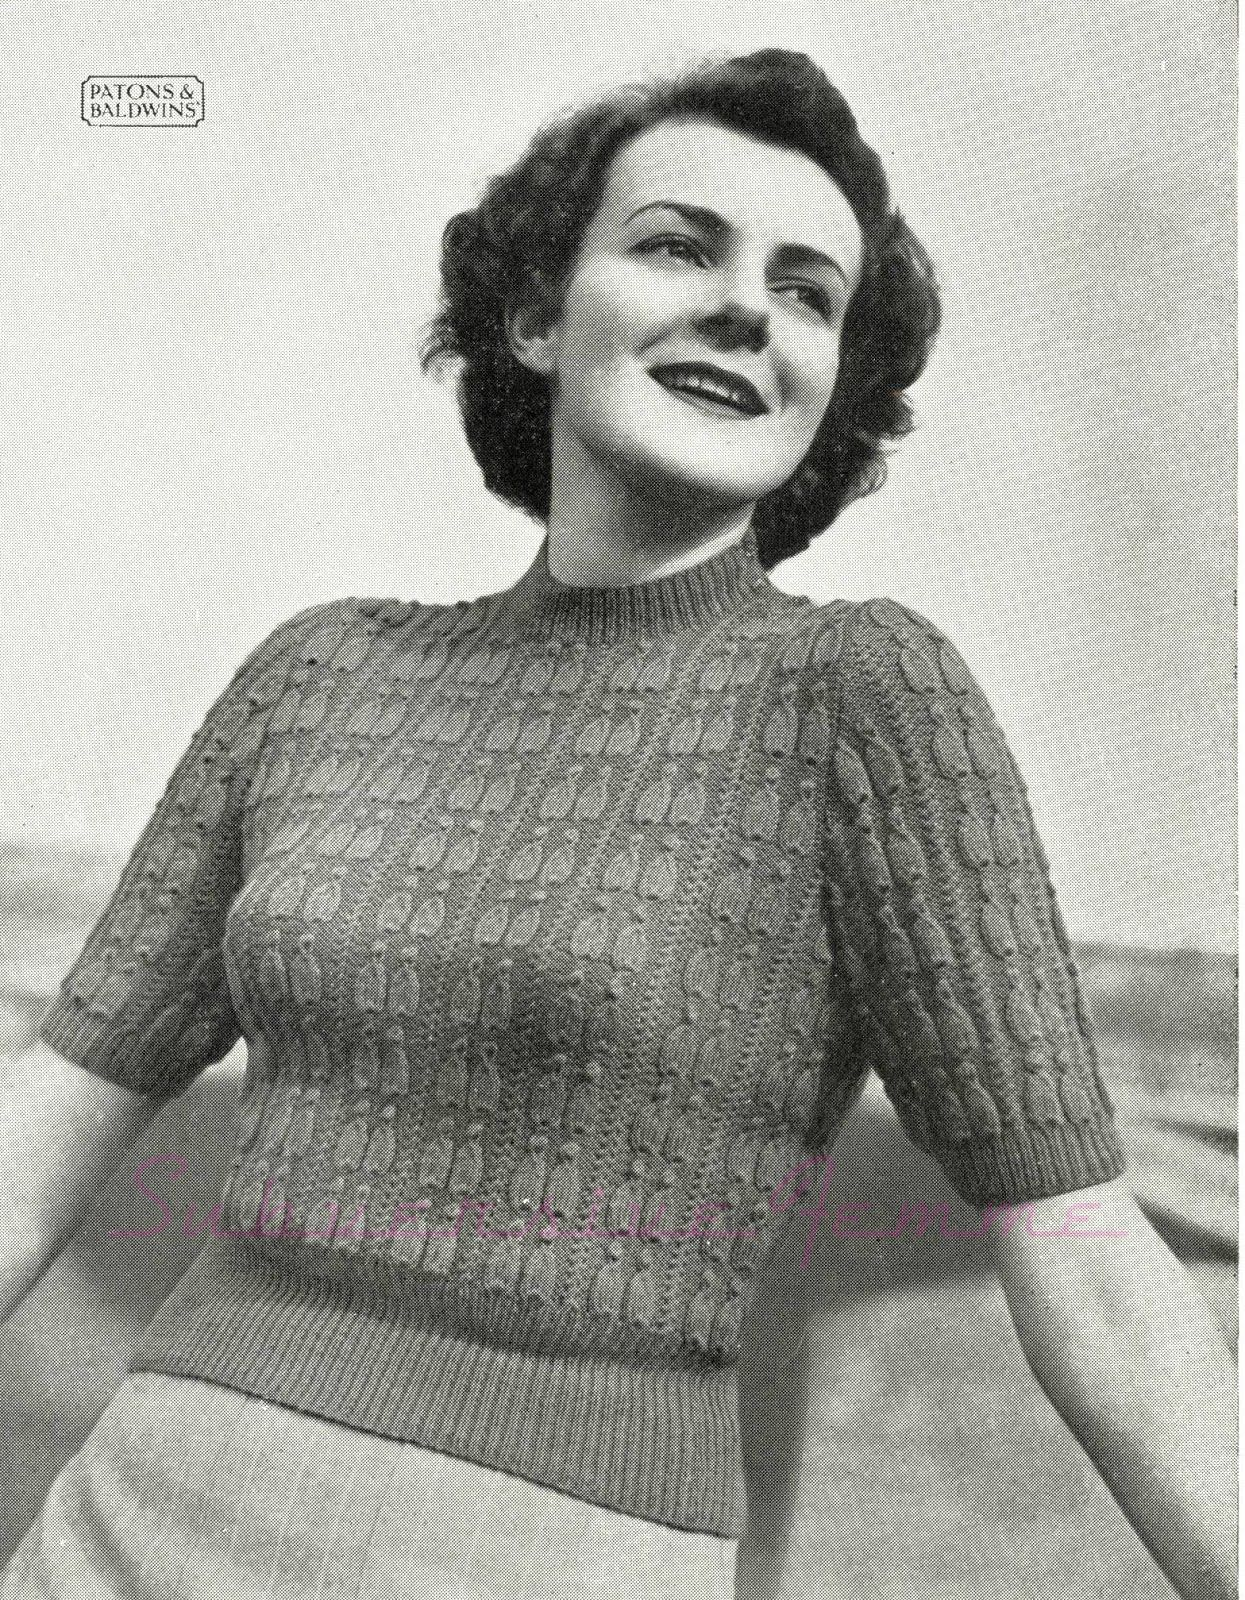 Enchanting Free Vintage Knitting Patterns 1940s Inspiration - Easy ...